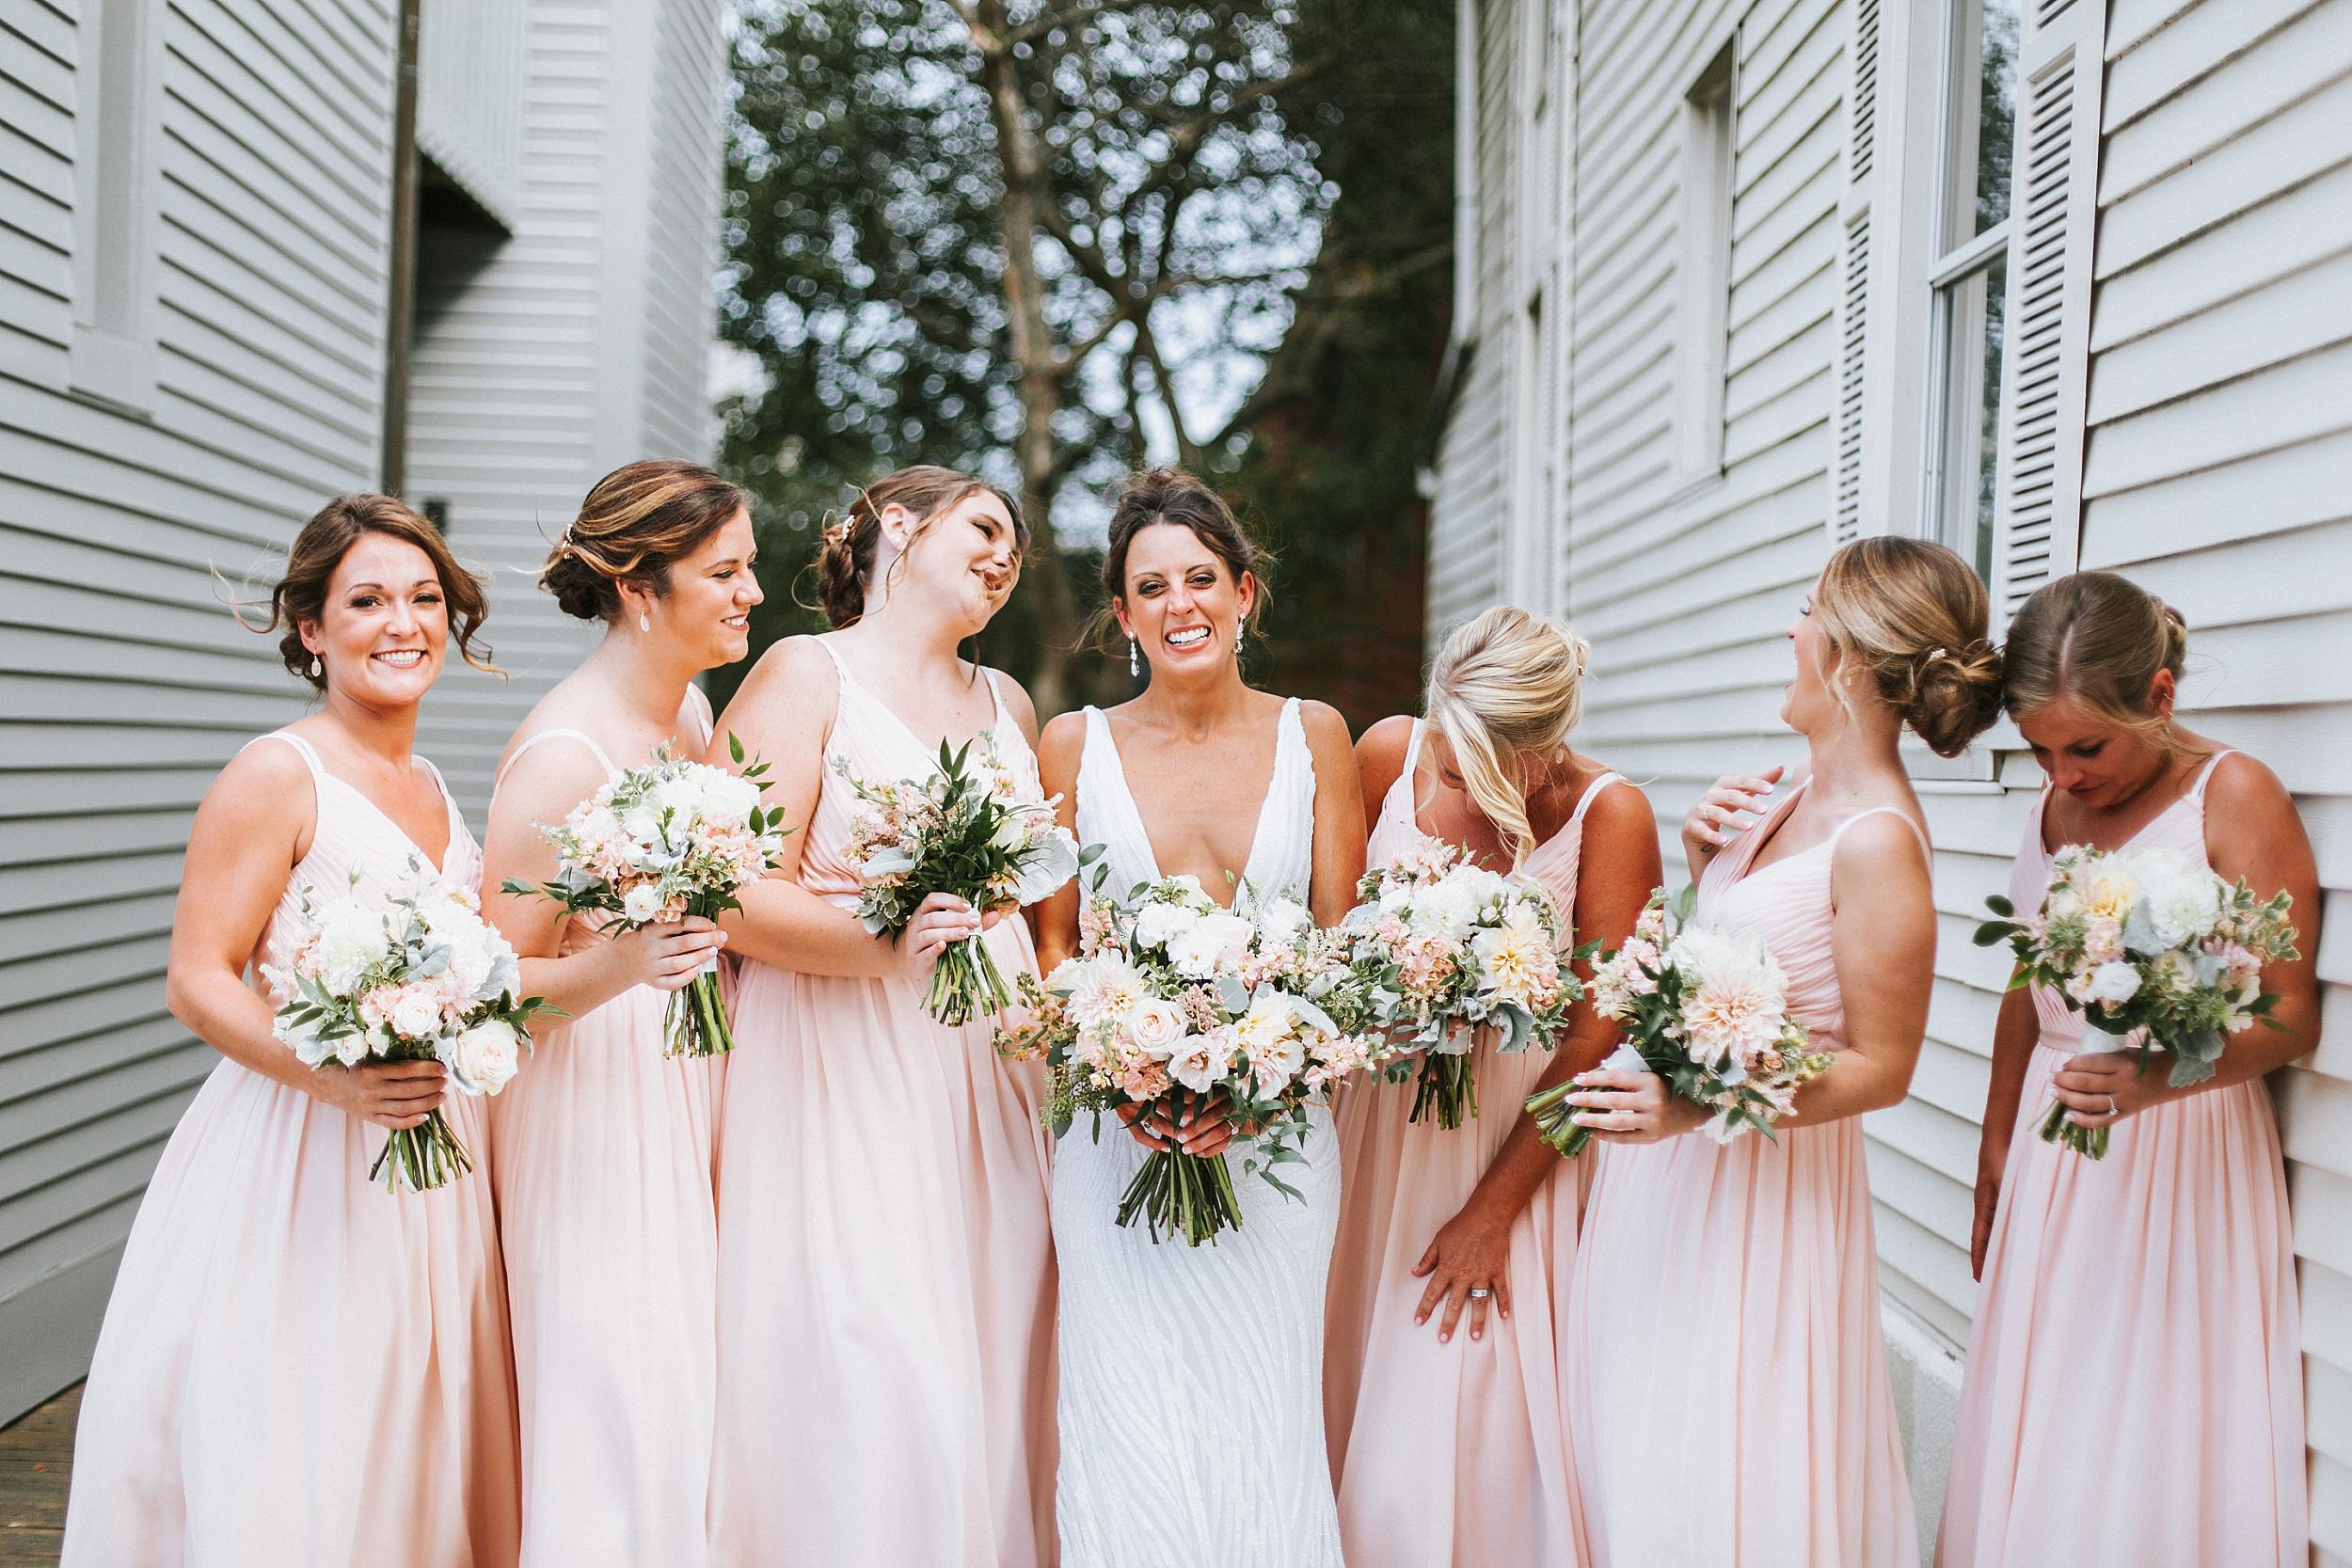 Brooke Townsend Photography - Cincinnati Wedding Photographer (57 of 170).jpg